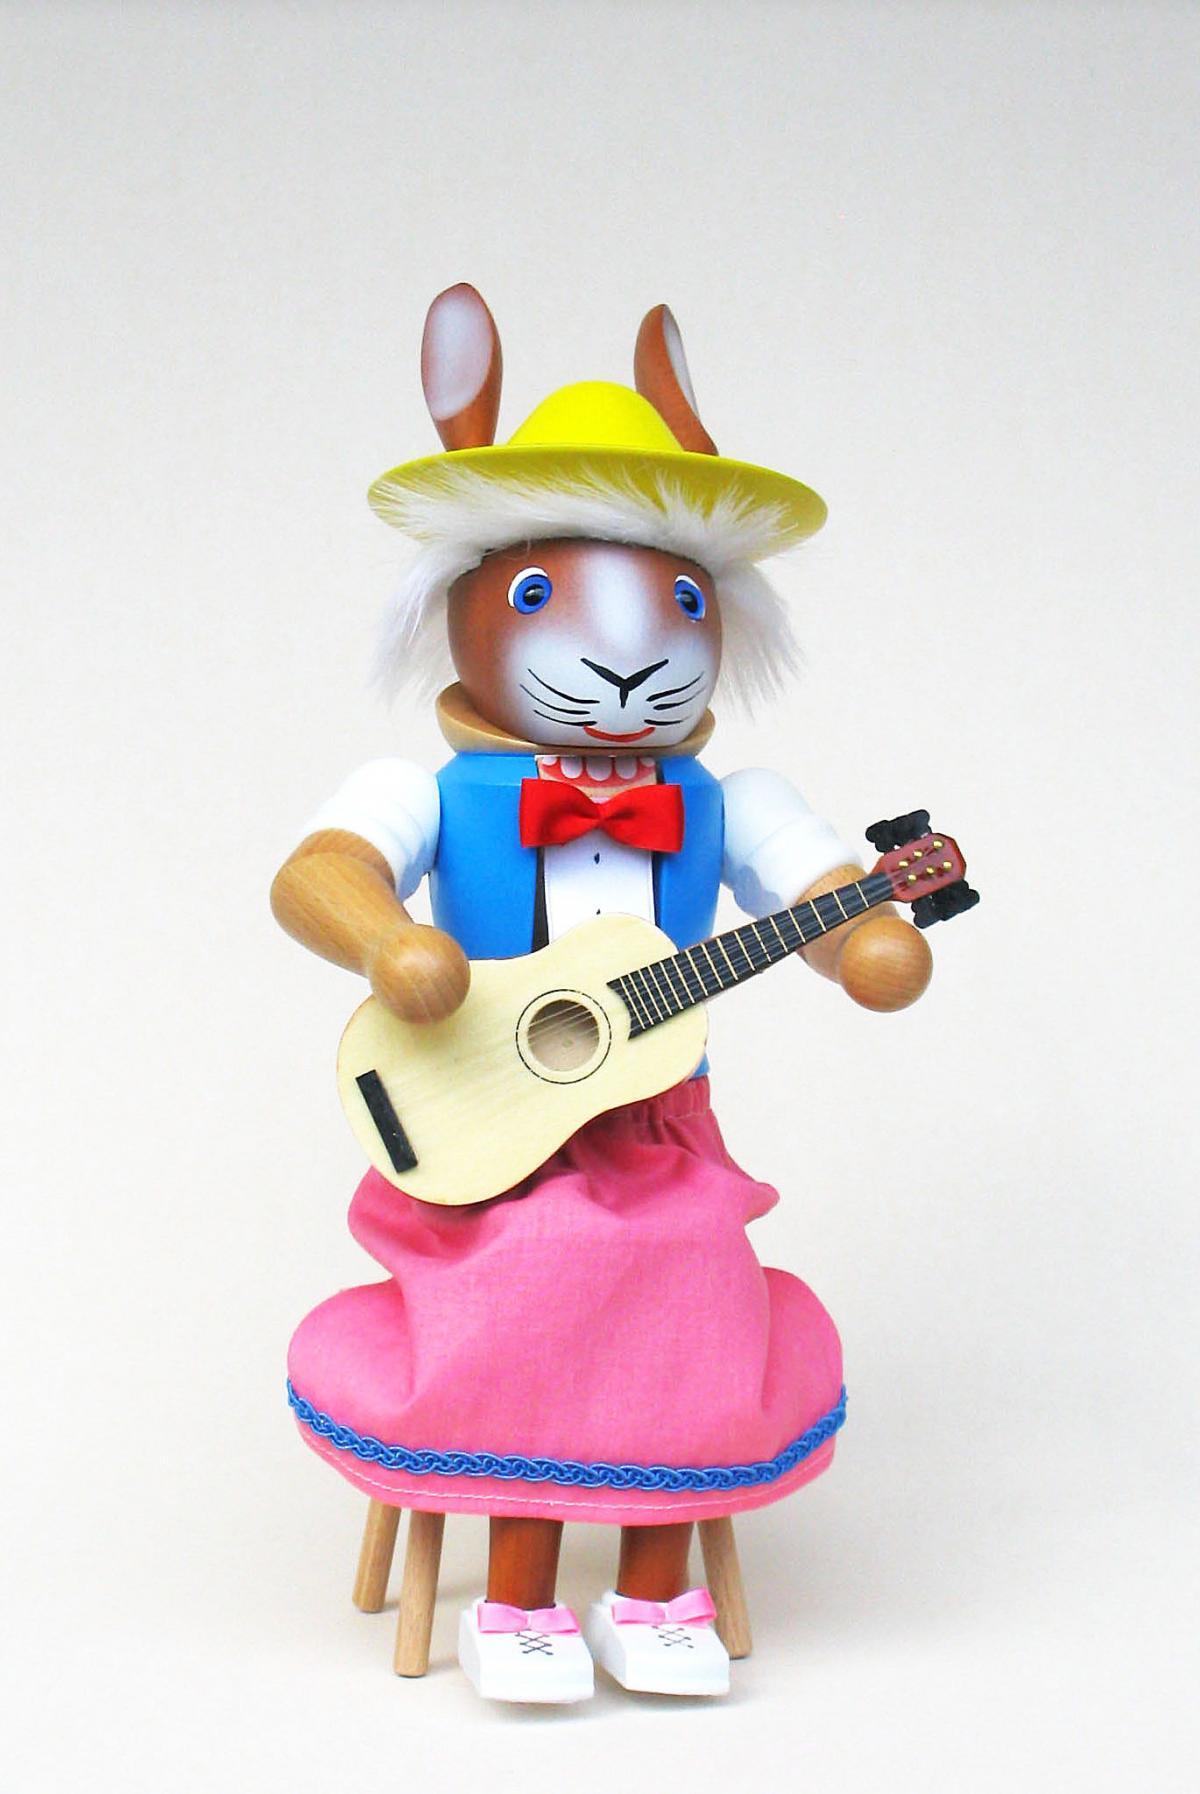 Nussknacker Osterhäsin mit Gitarre und Hocker